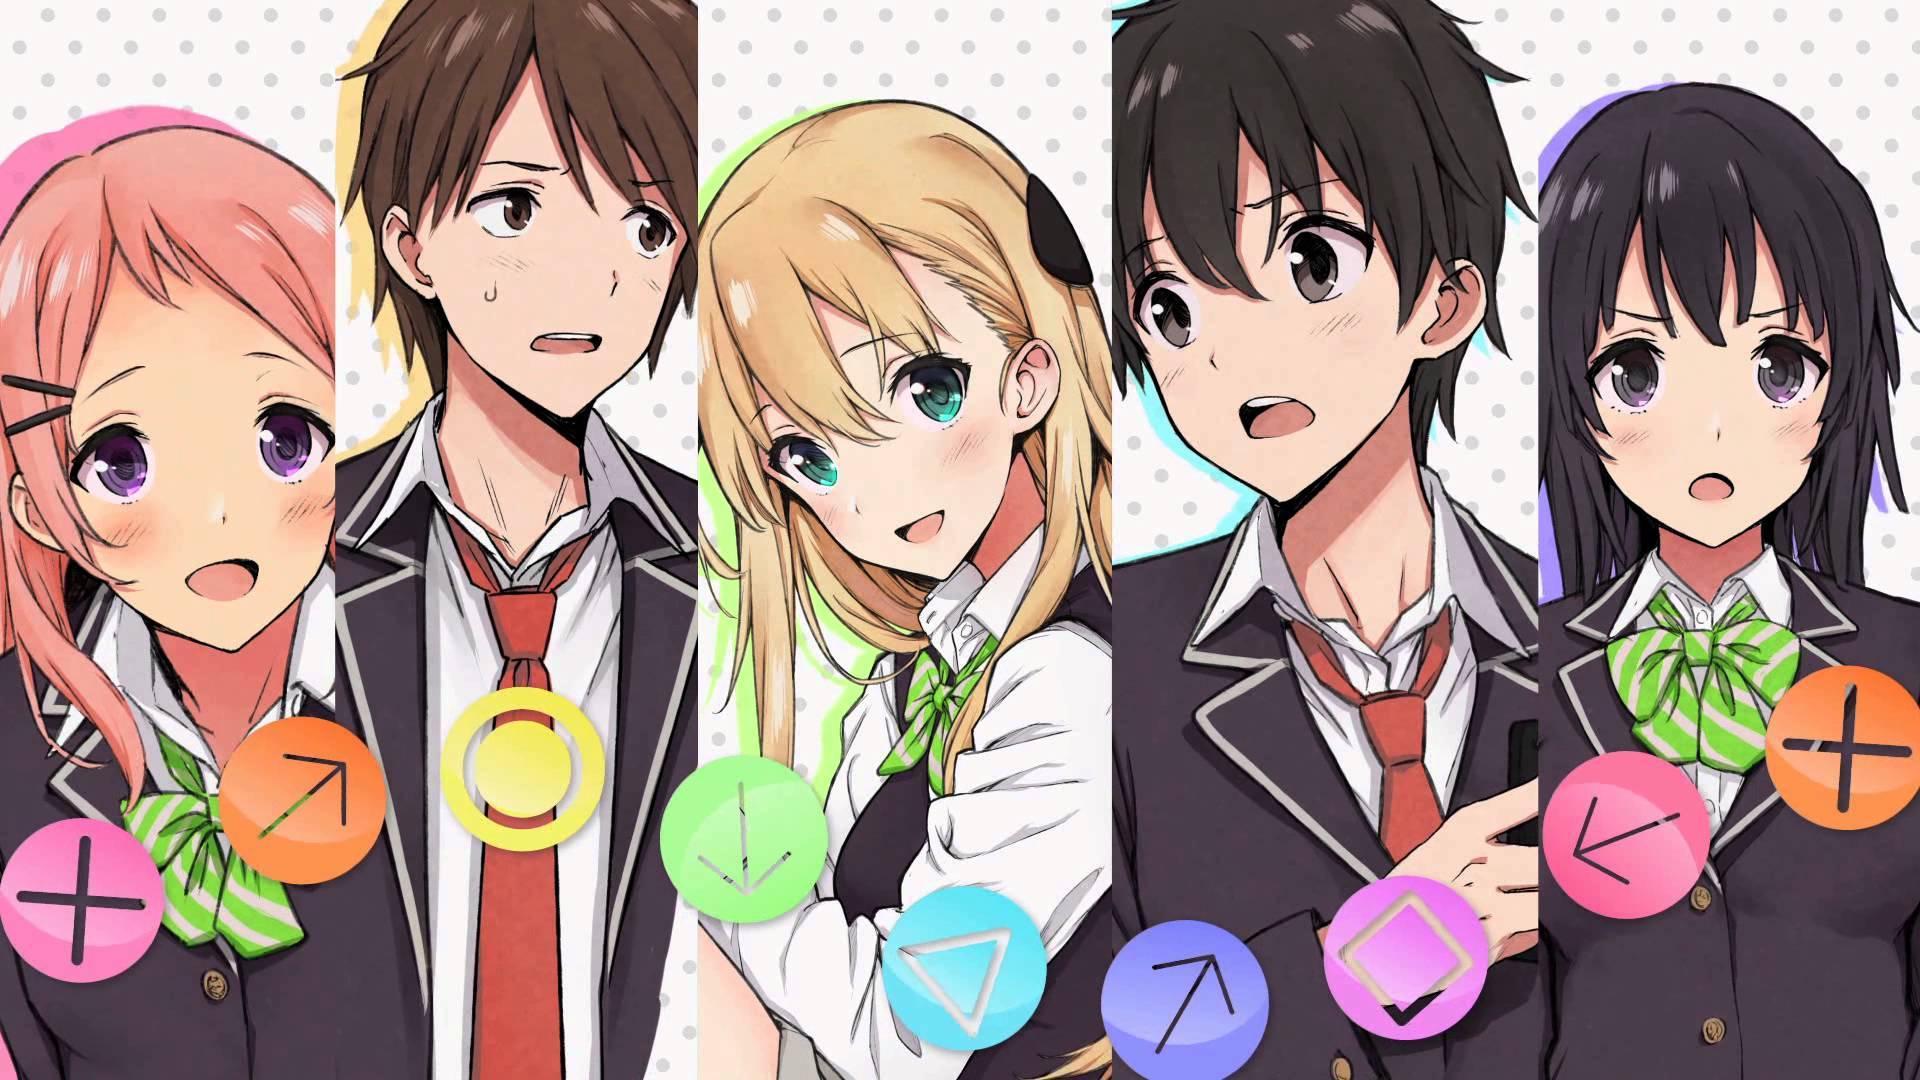 Wallpaper Anime Gamers Aguri Gamers Amano Keita Karen Tendou